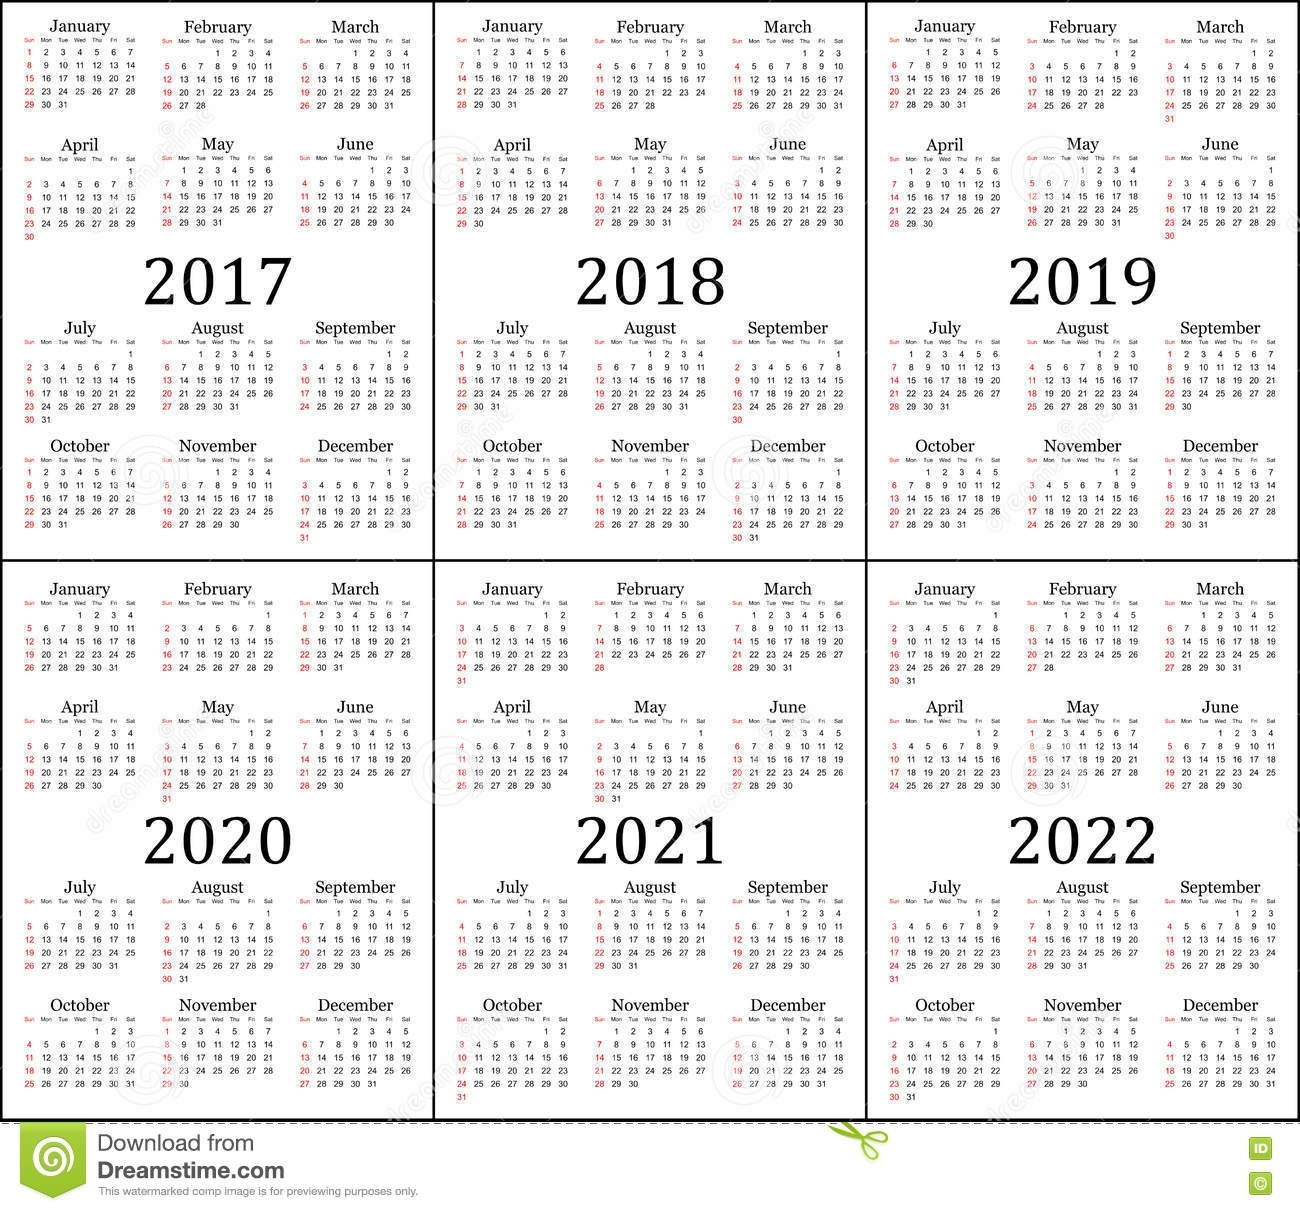 Free Printable Calendars 3 Year Ten Free Printable